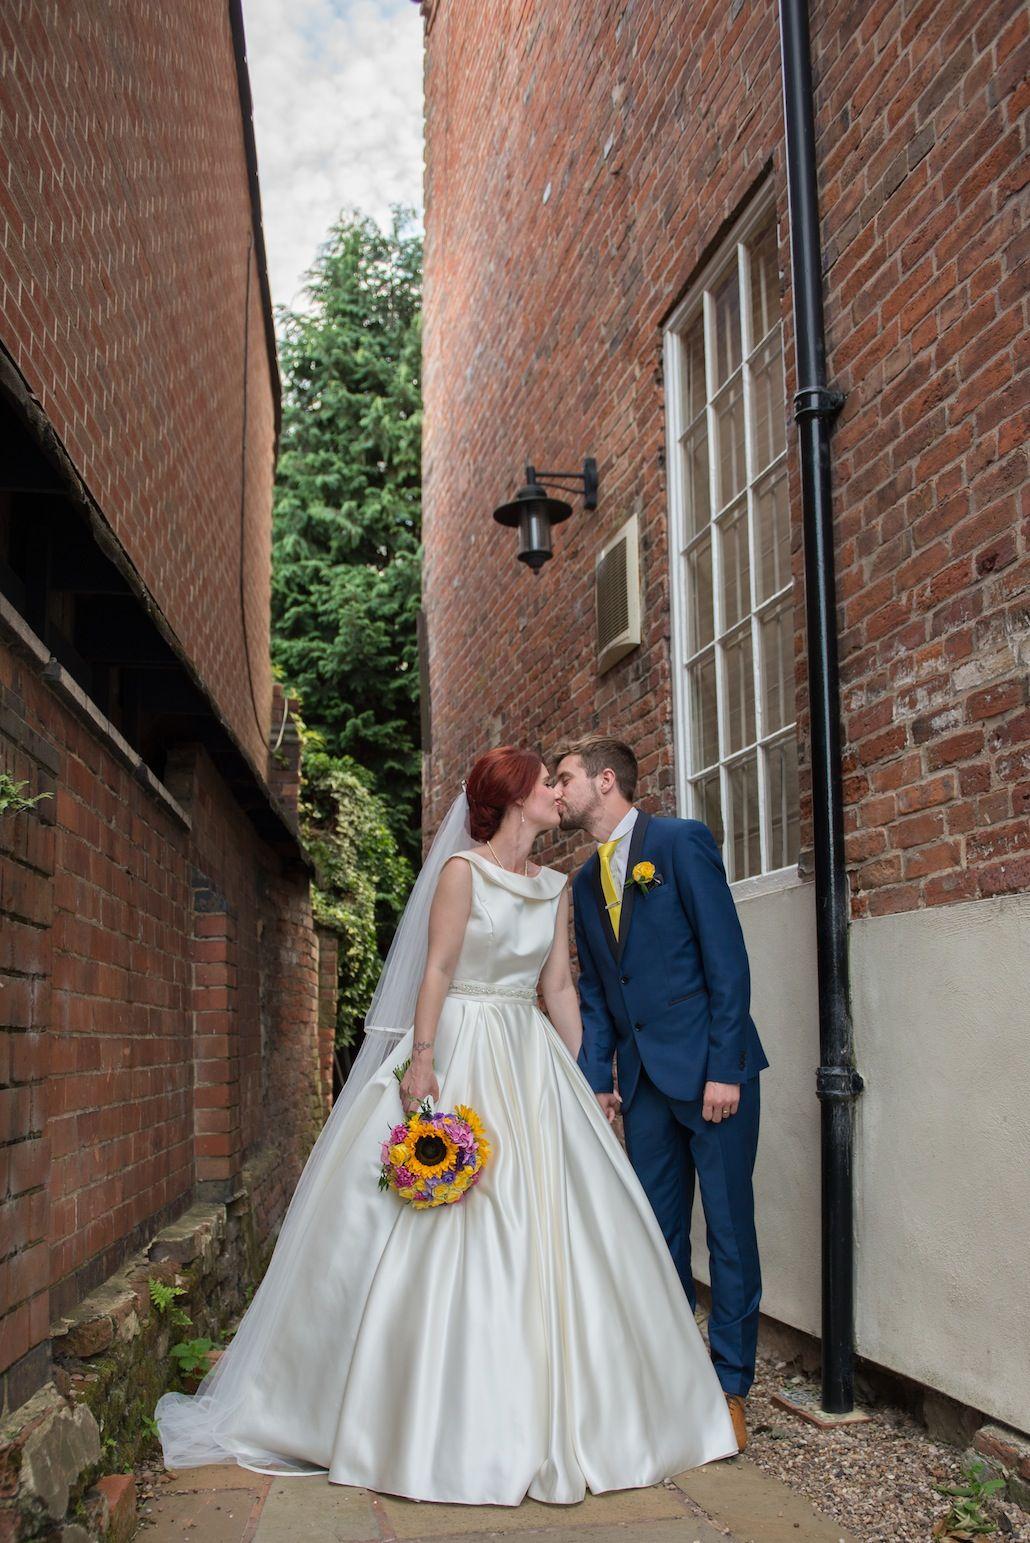 Katie And Scotts Wedding Photography Masa Restaurant In Derby